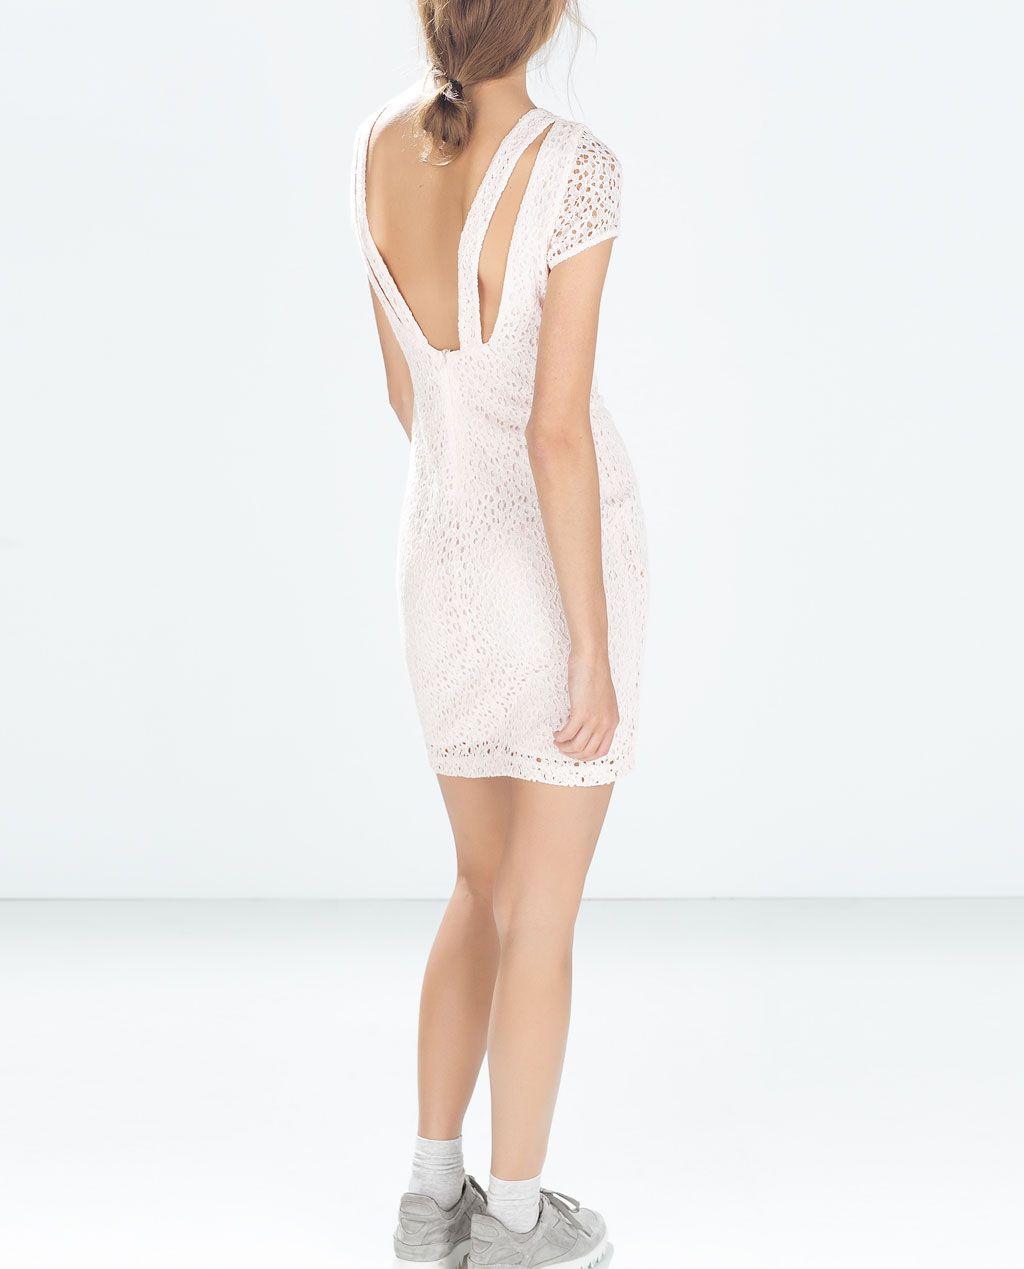 White lace dress zara  Pin by Mireia Borràs Roca on Roba  Pinterest  Tube dress Zara